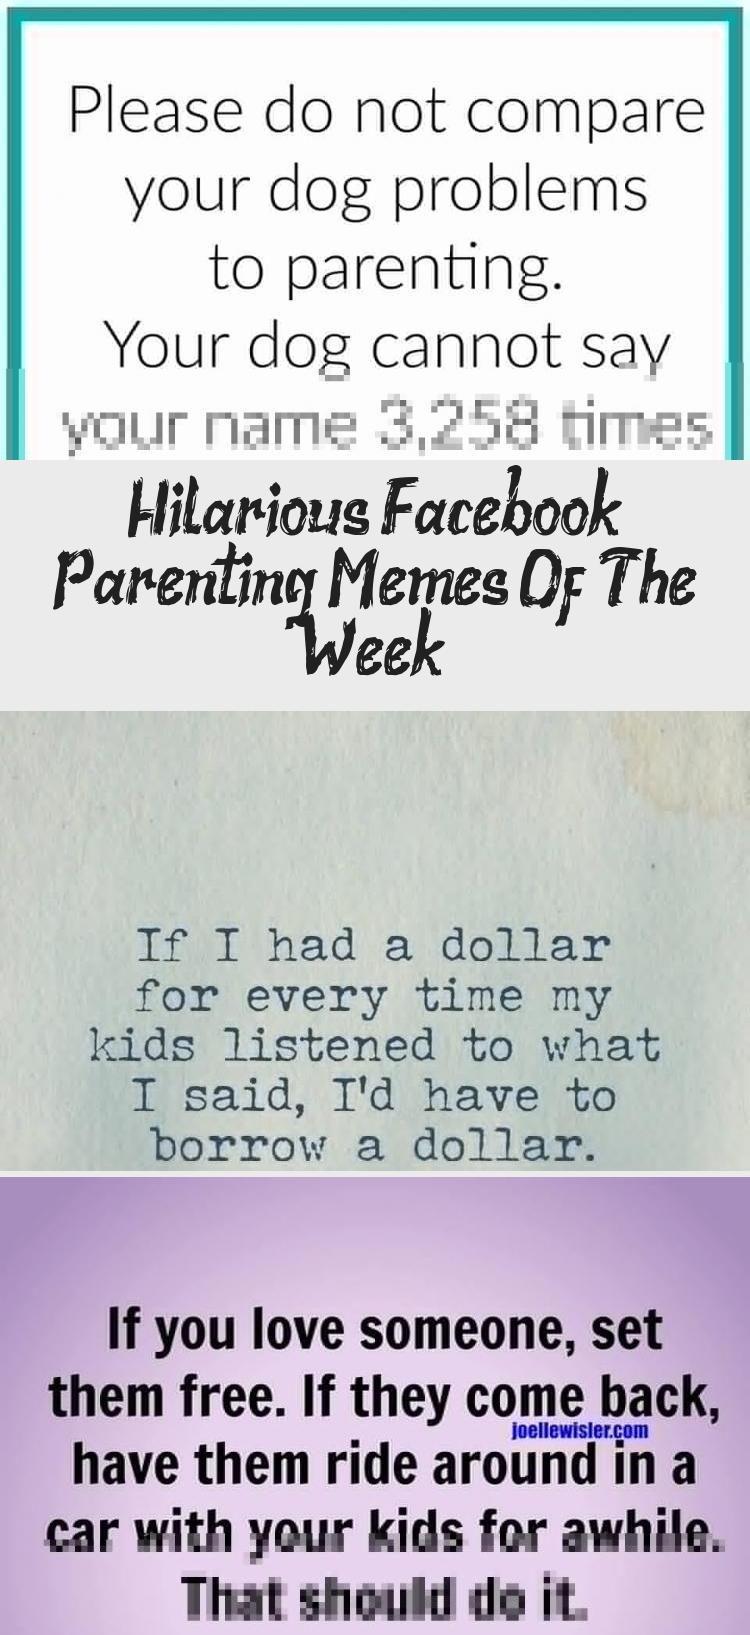 Hilarious Facebook Parenting Memes Of The Week Parenting Memes Mom Humor Funny Parenting Memes